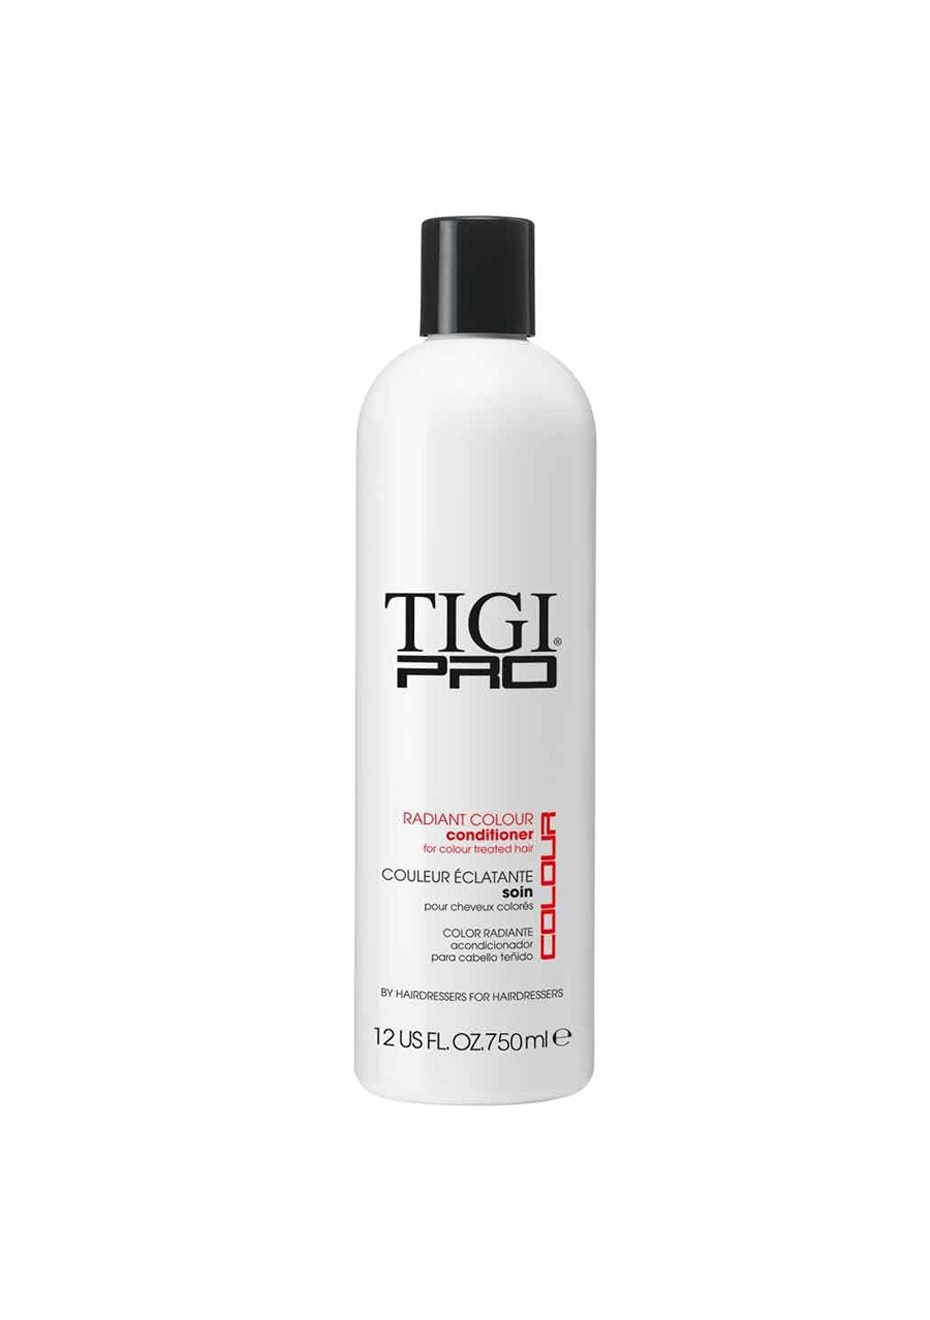 Tigi Pro Radiant Colour Conditioner 750ml